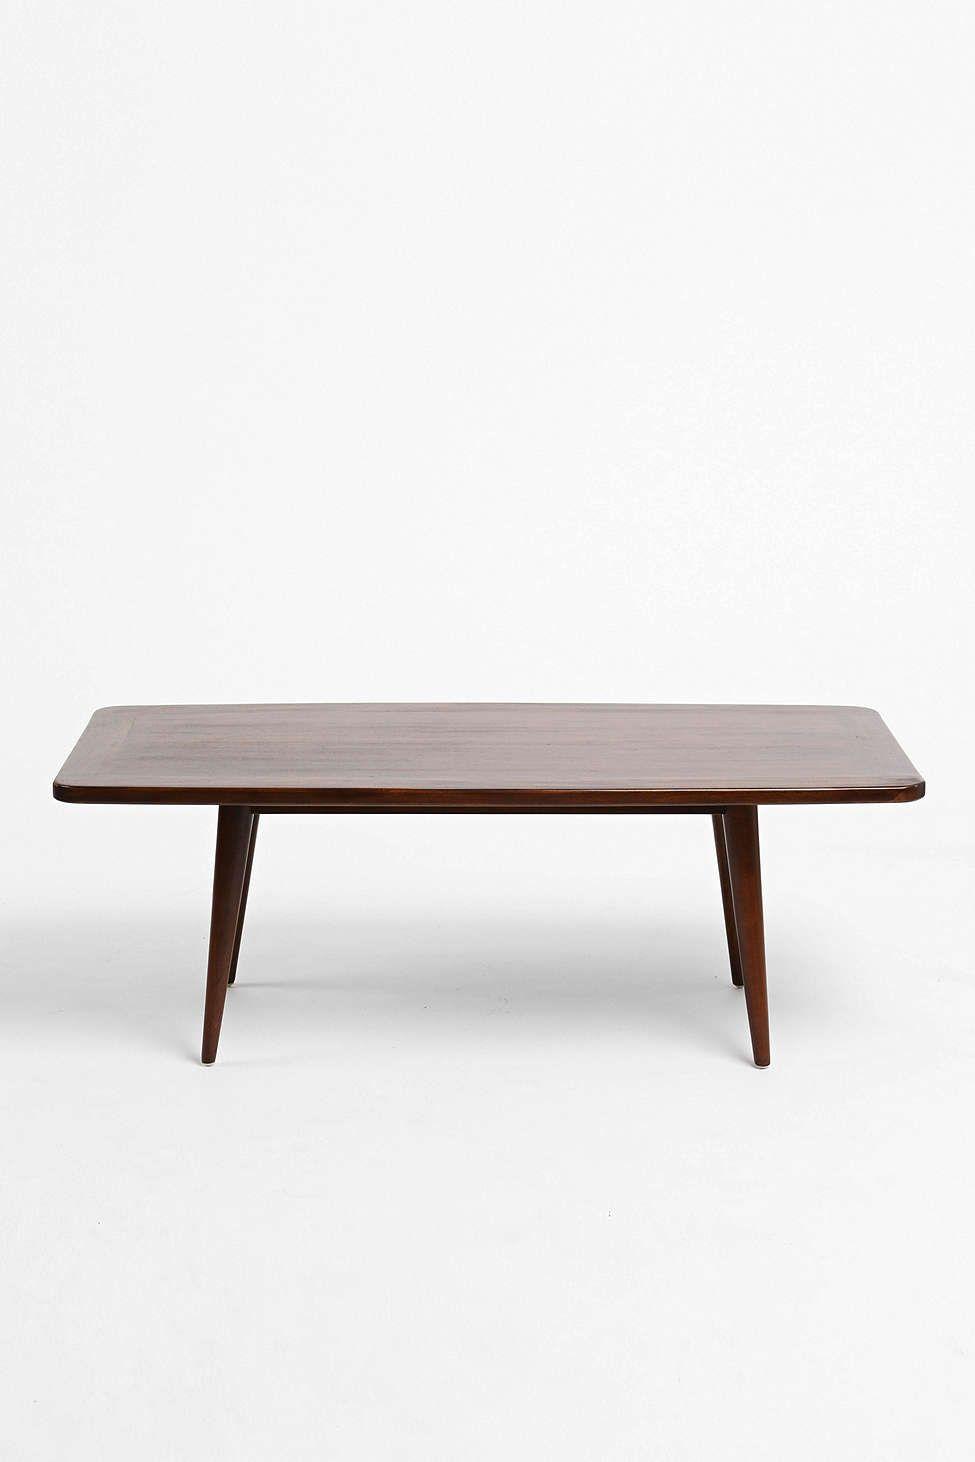 "length: 47.25"" - width: 23.625"" - height: 16.5"" moda coffee table"